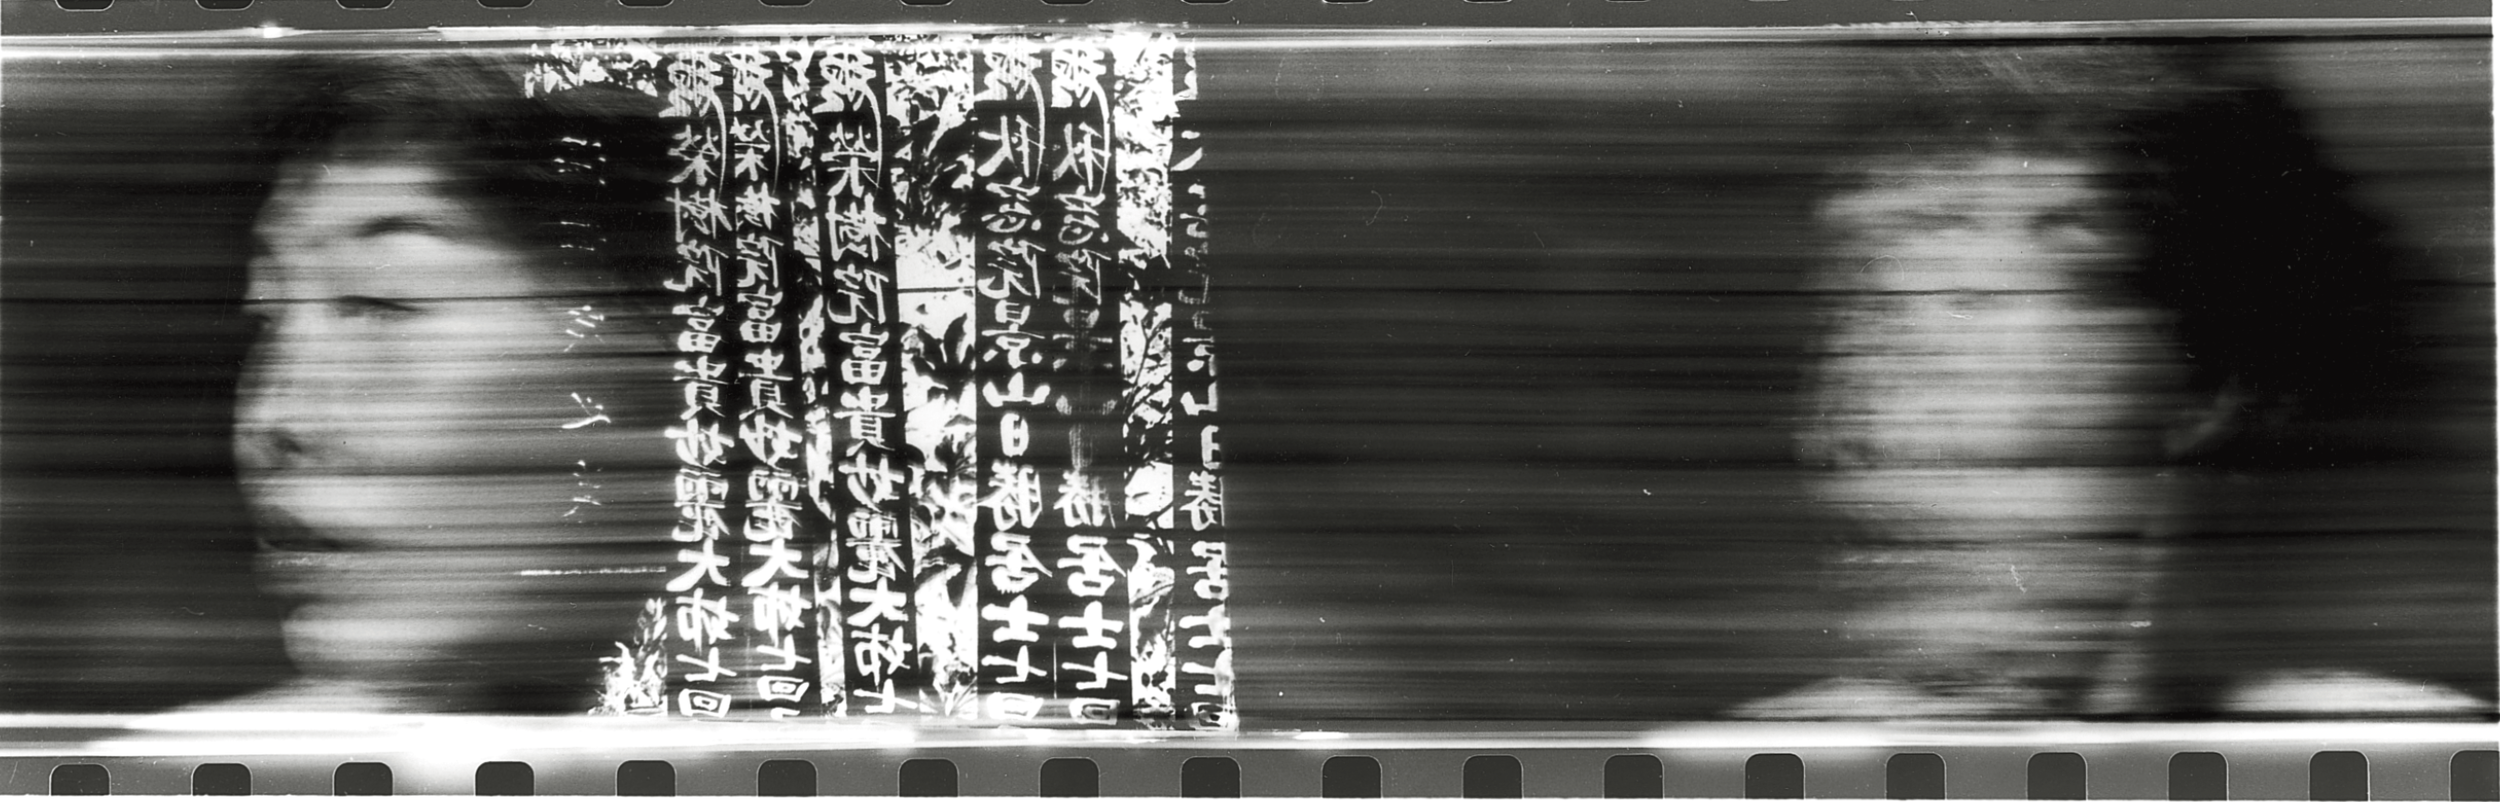 GIOLI_VA_TOKYO 1996-28.png